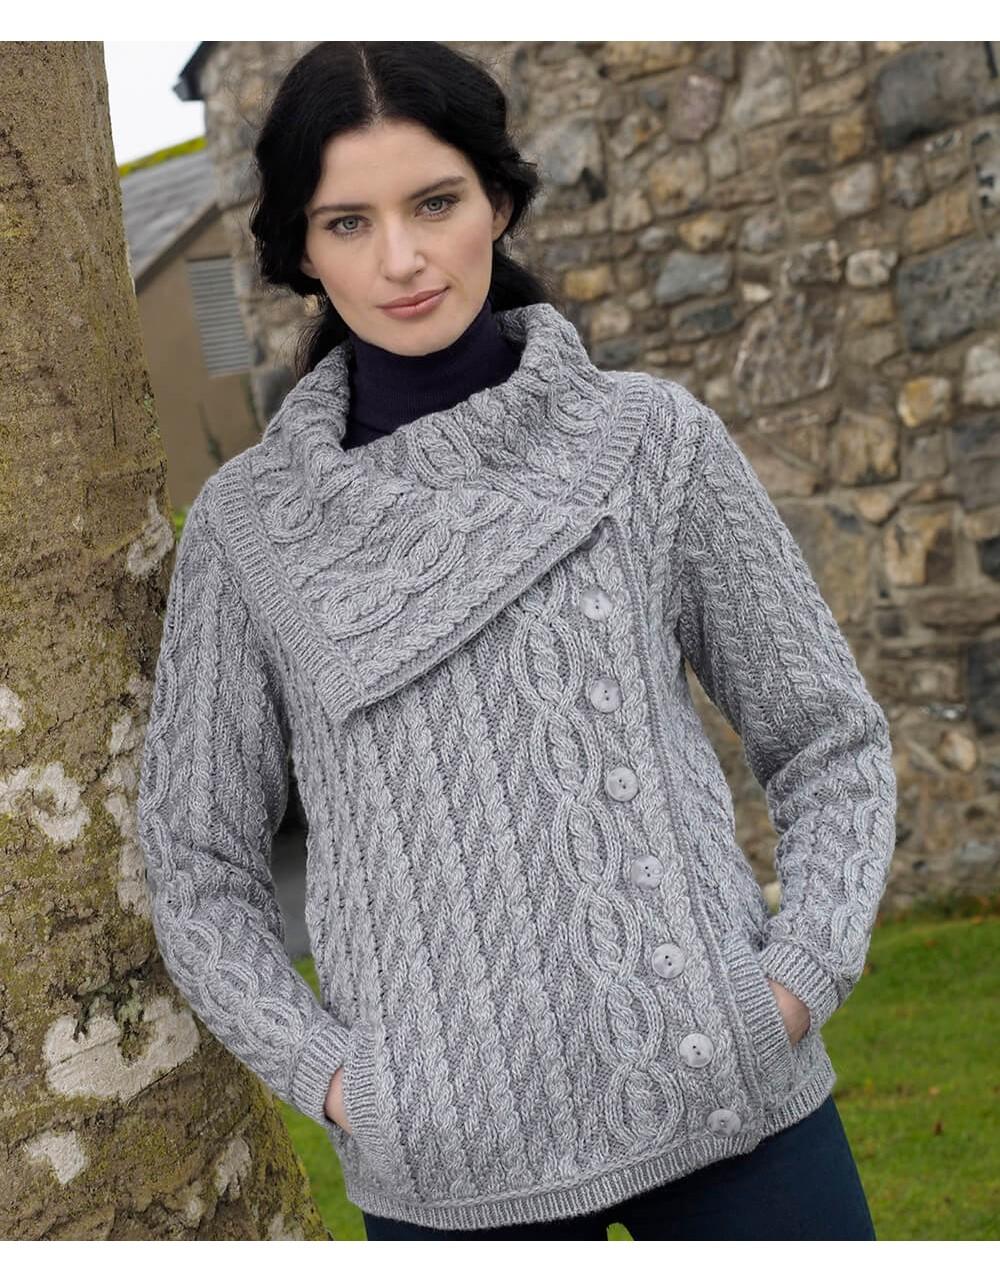 Large Collar Plated Cable Knit Jacket|Aran Cardigans|Irish Handcrafts -2